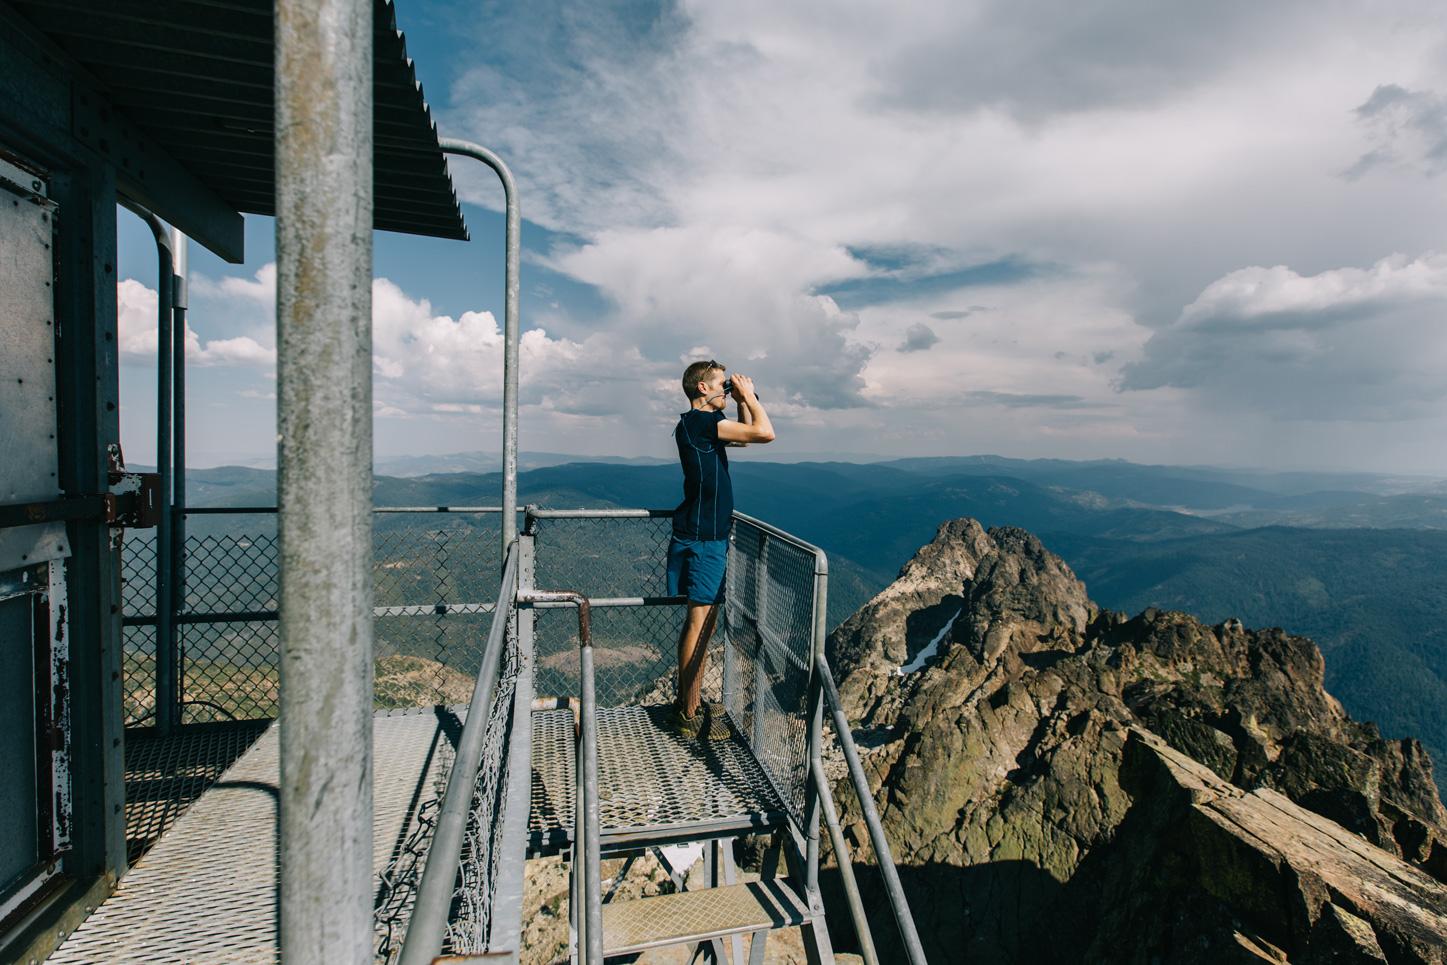 CindyGiovagnoli_outdoors_photographer_Sierra_Buttes_firetower_watchtower_Sardine_Snag_Bear_lake_hike_swim_camp-024.jpg